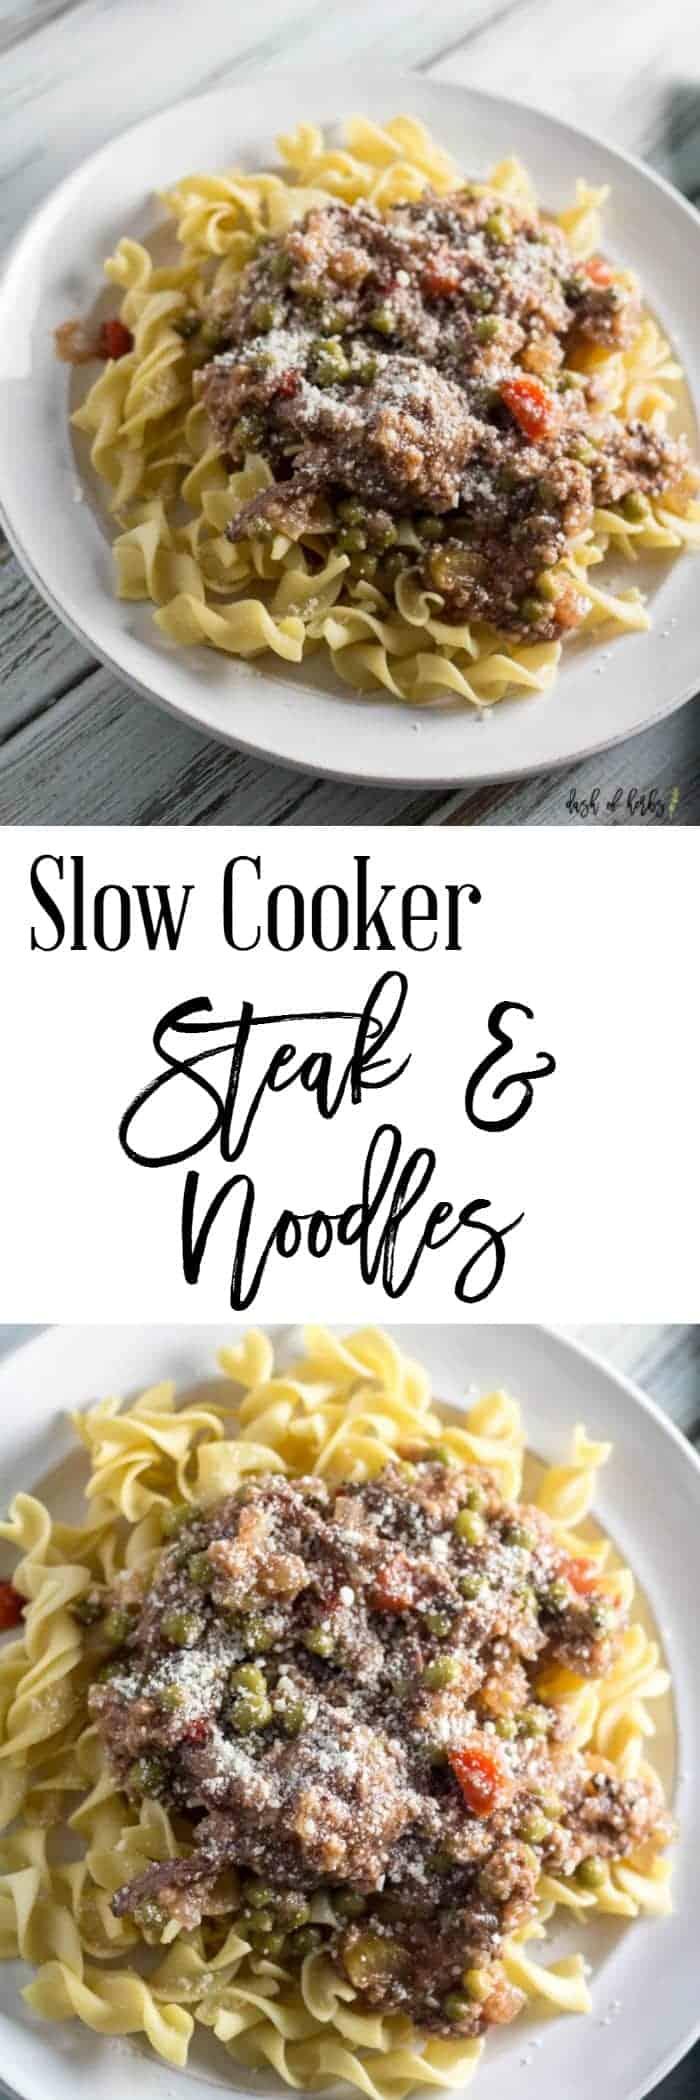 Slow Cooker Steak and Noodles